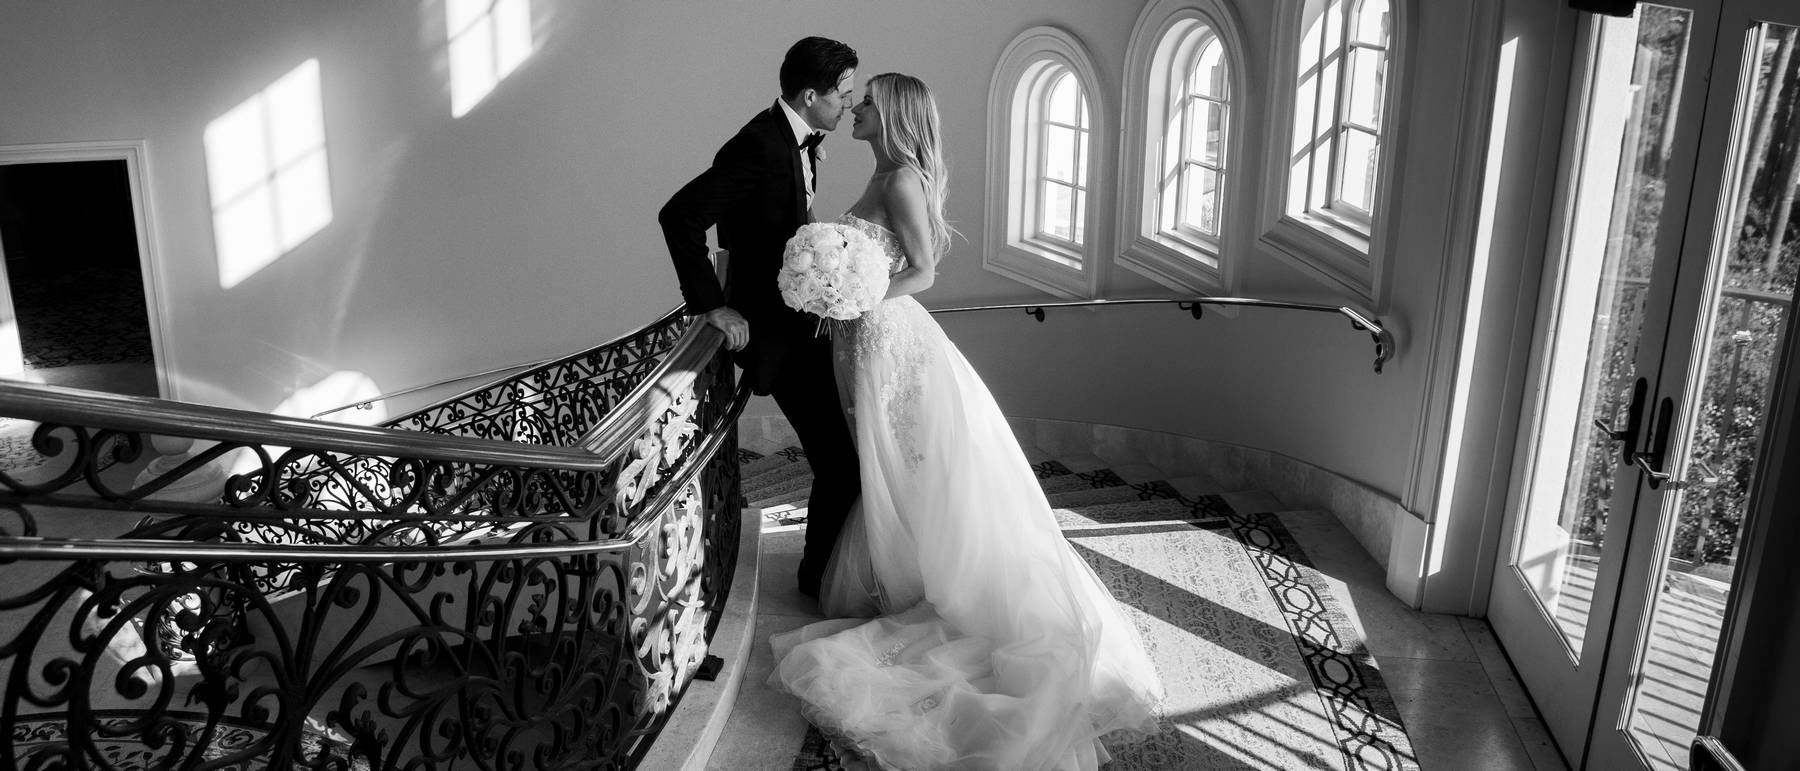 johnandjoseph-wedding-photographer-hz-slider-272